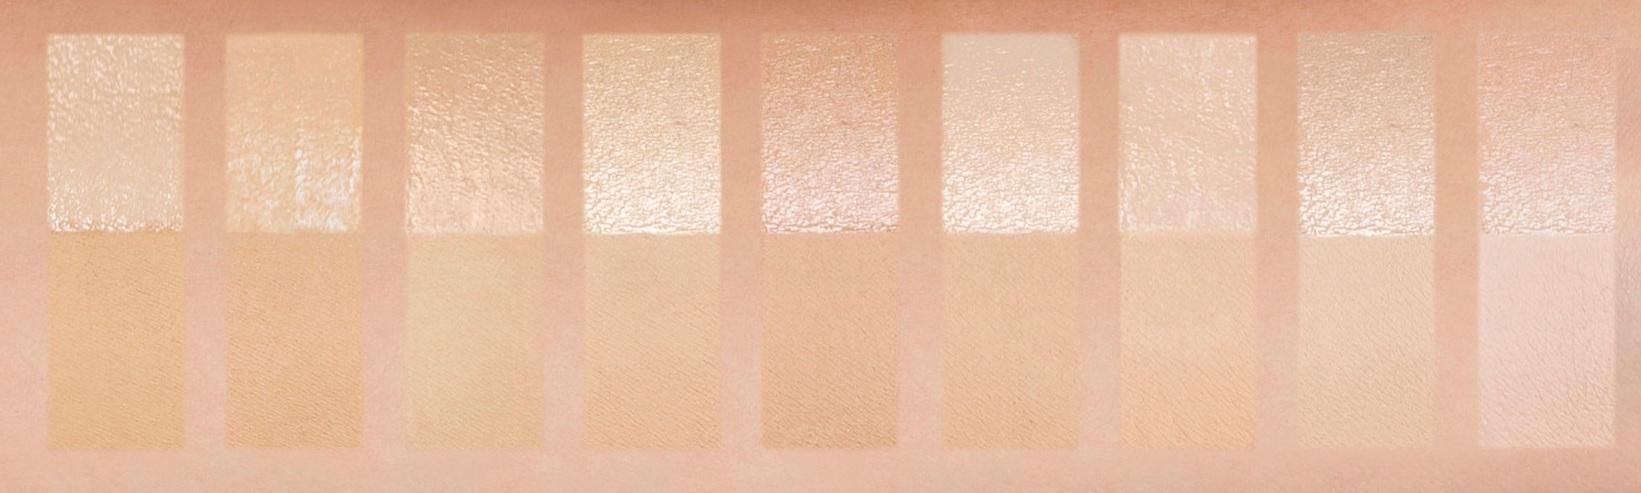 Magic Vanish Color Corrector by Charlotte Tilbury #19